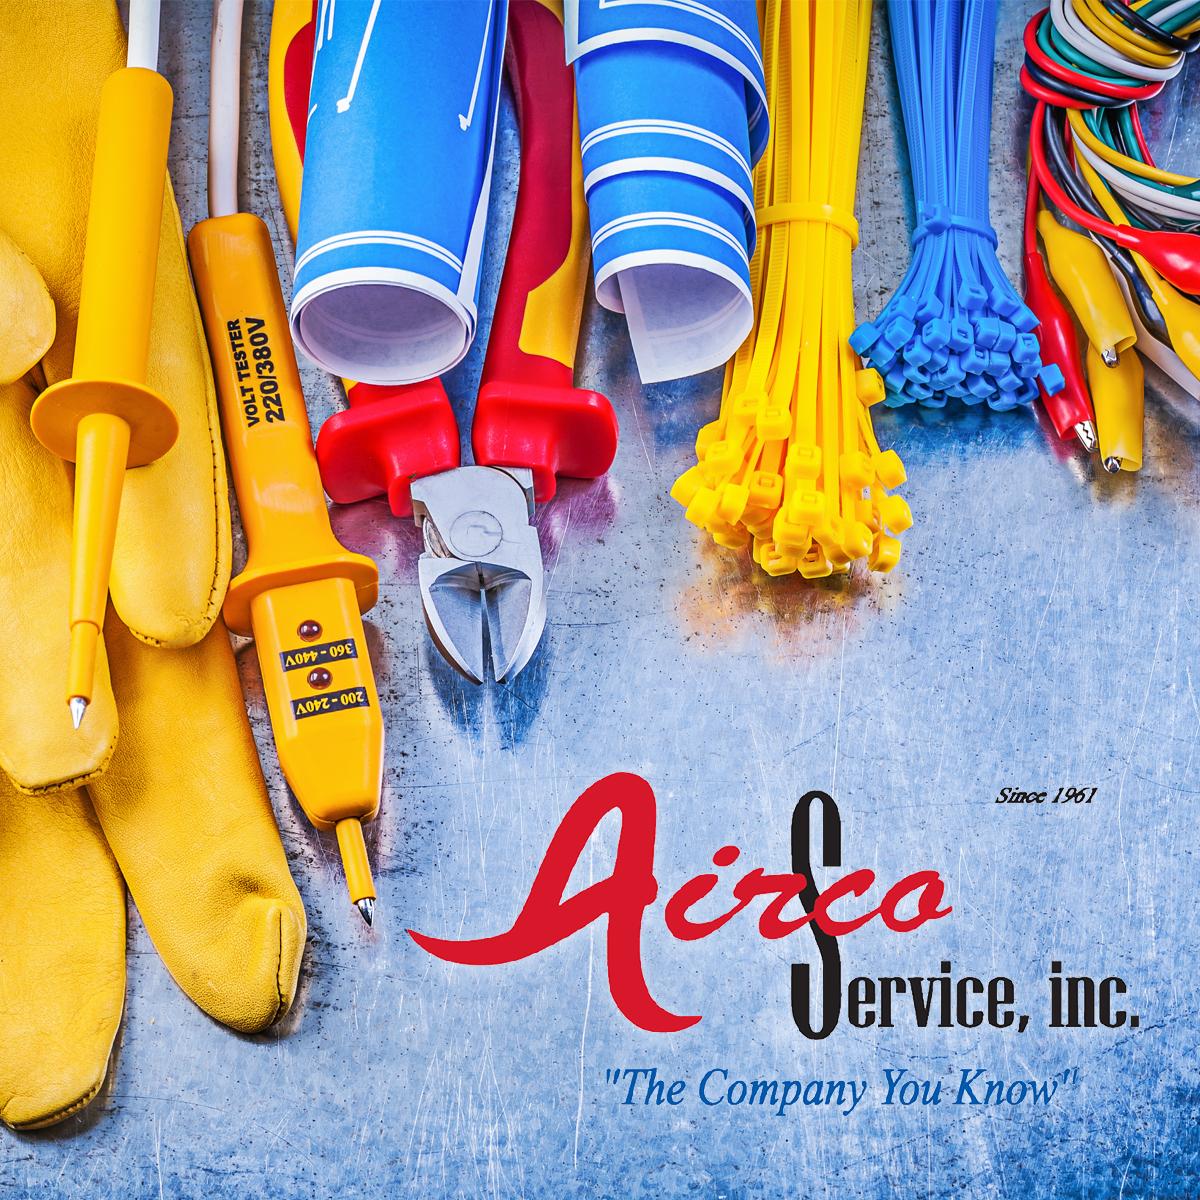 Airco Service | Home Service Providers